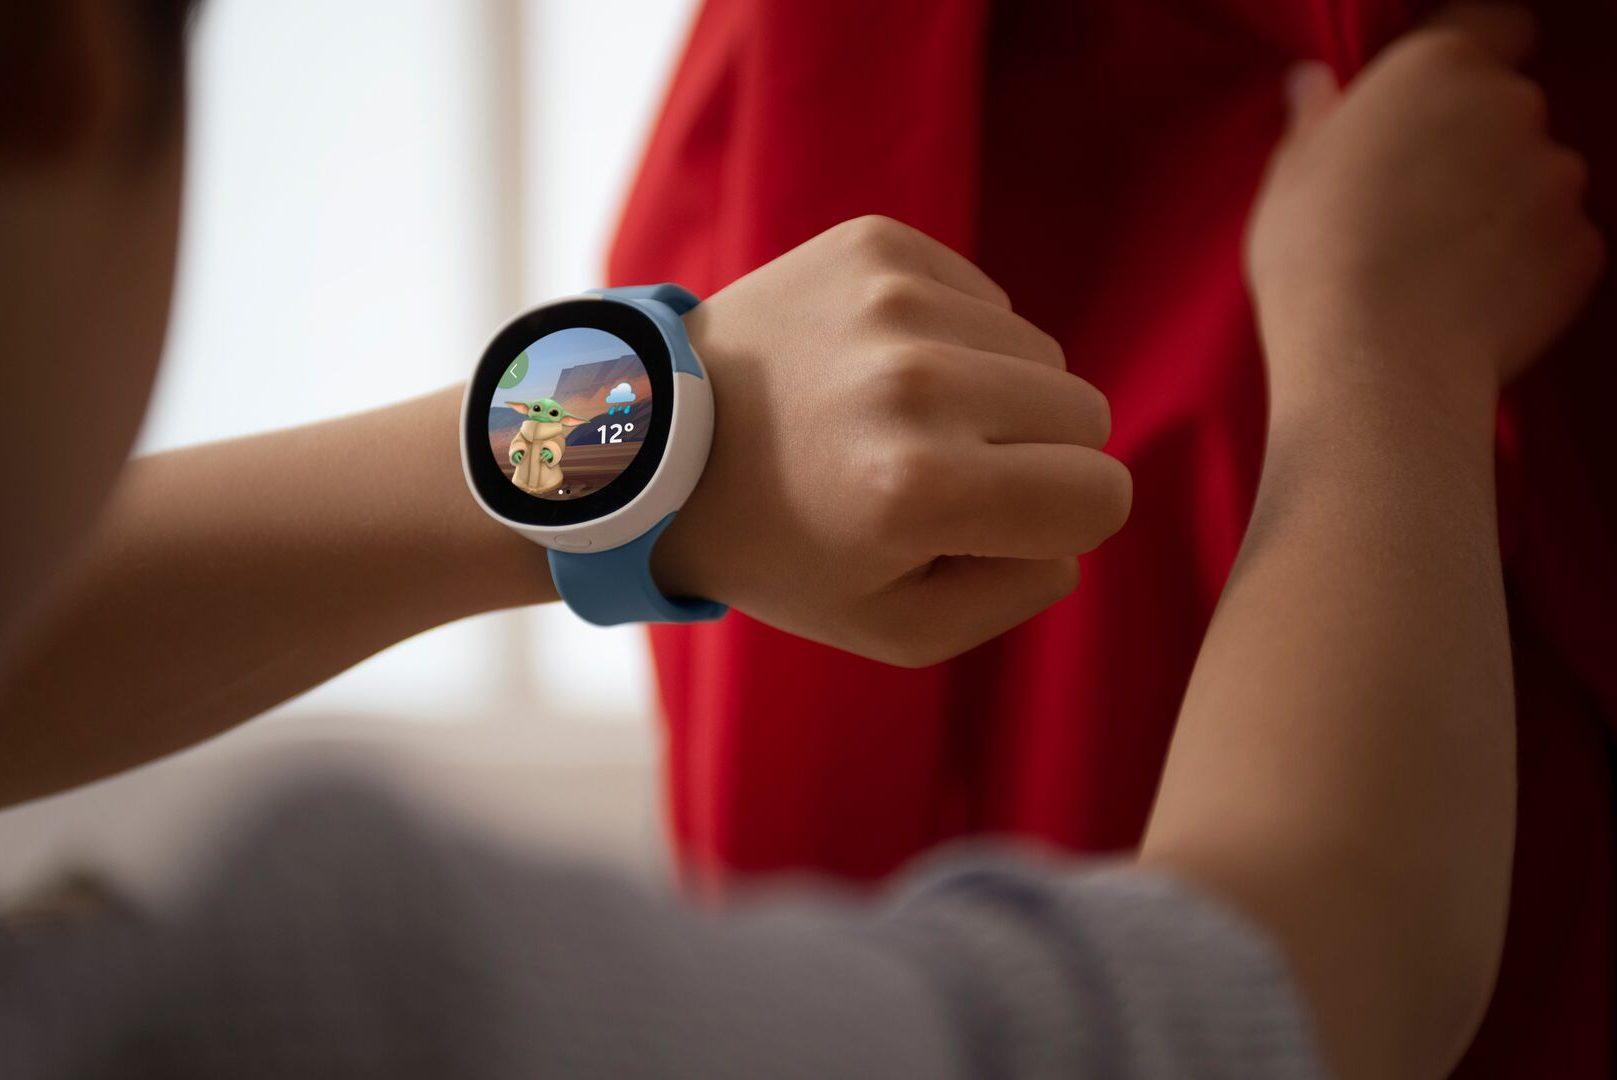 illustrative image of the Vodafone Neo Disney smartwatch for kids